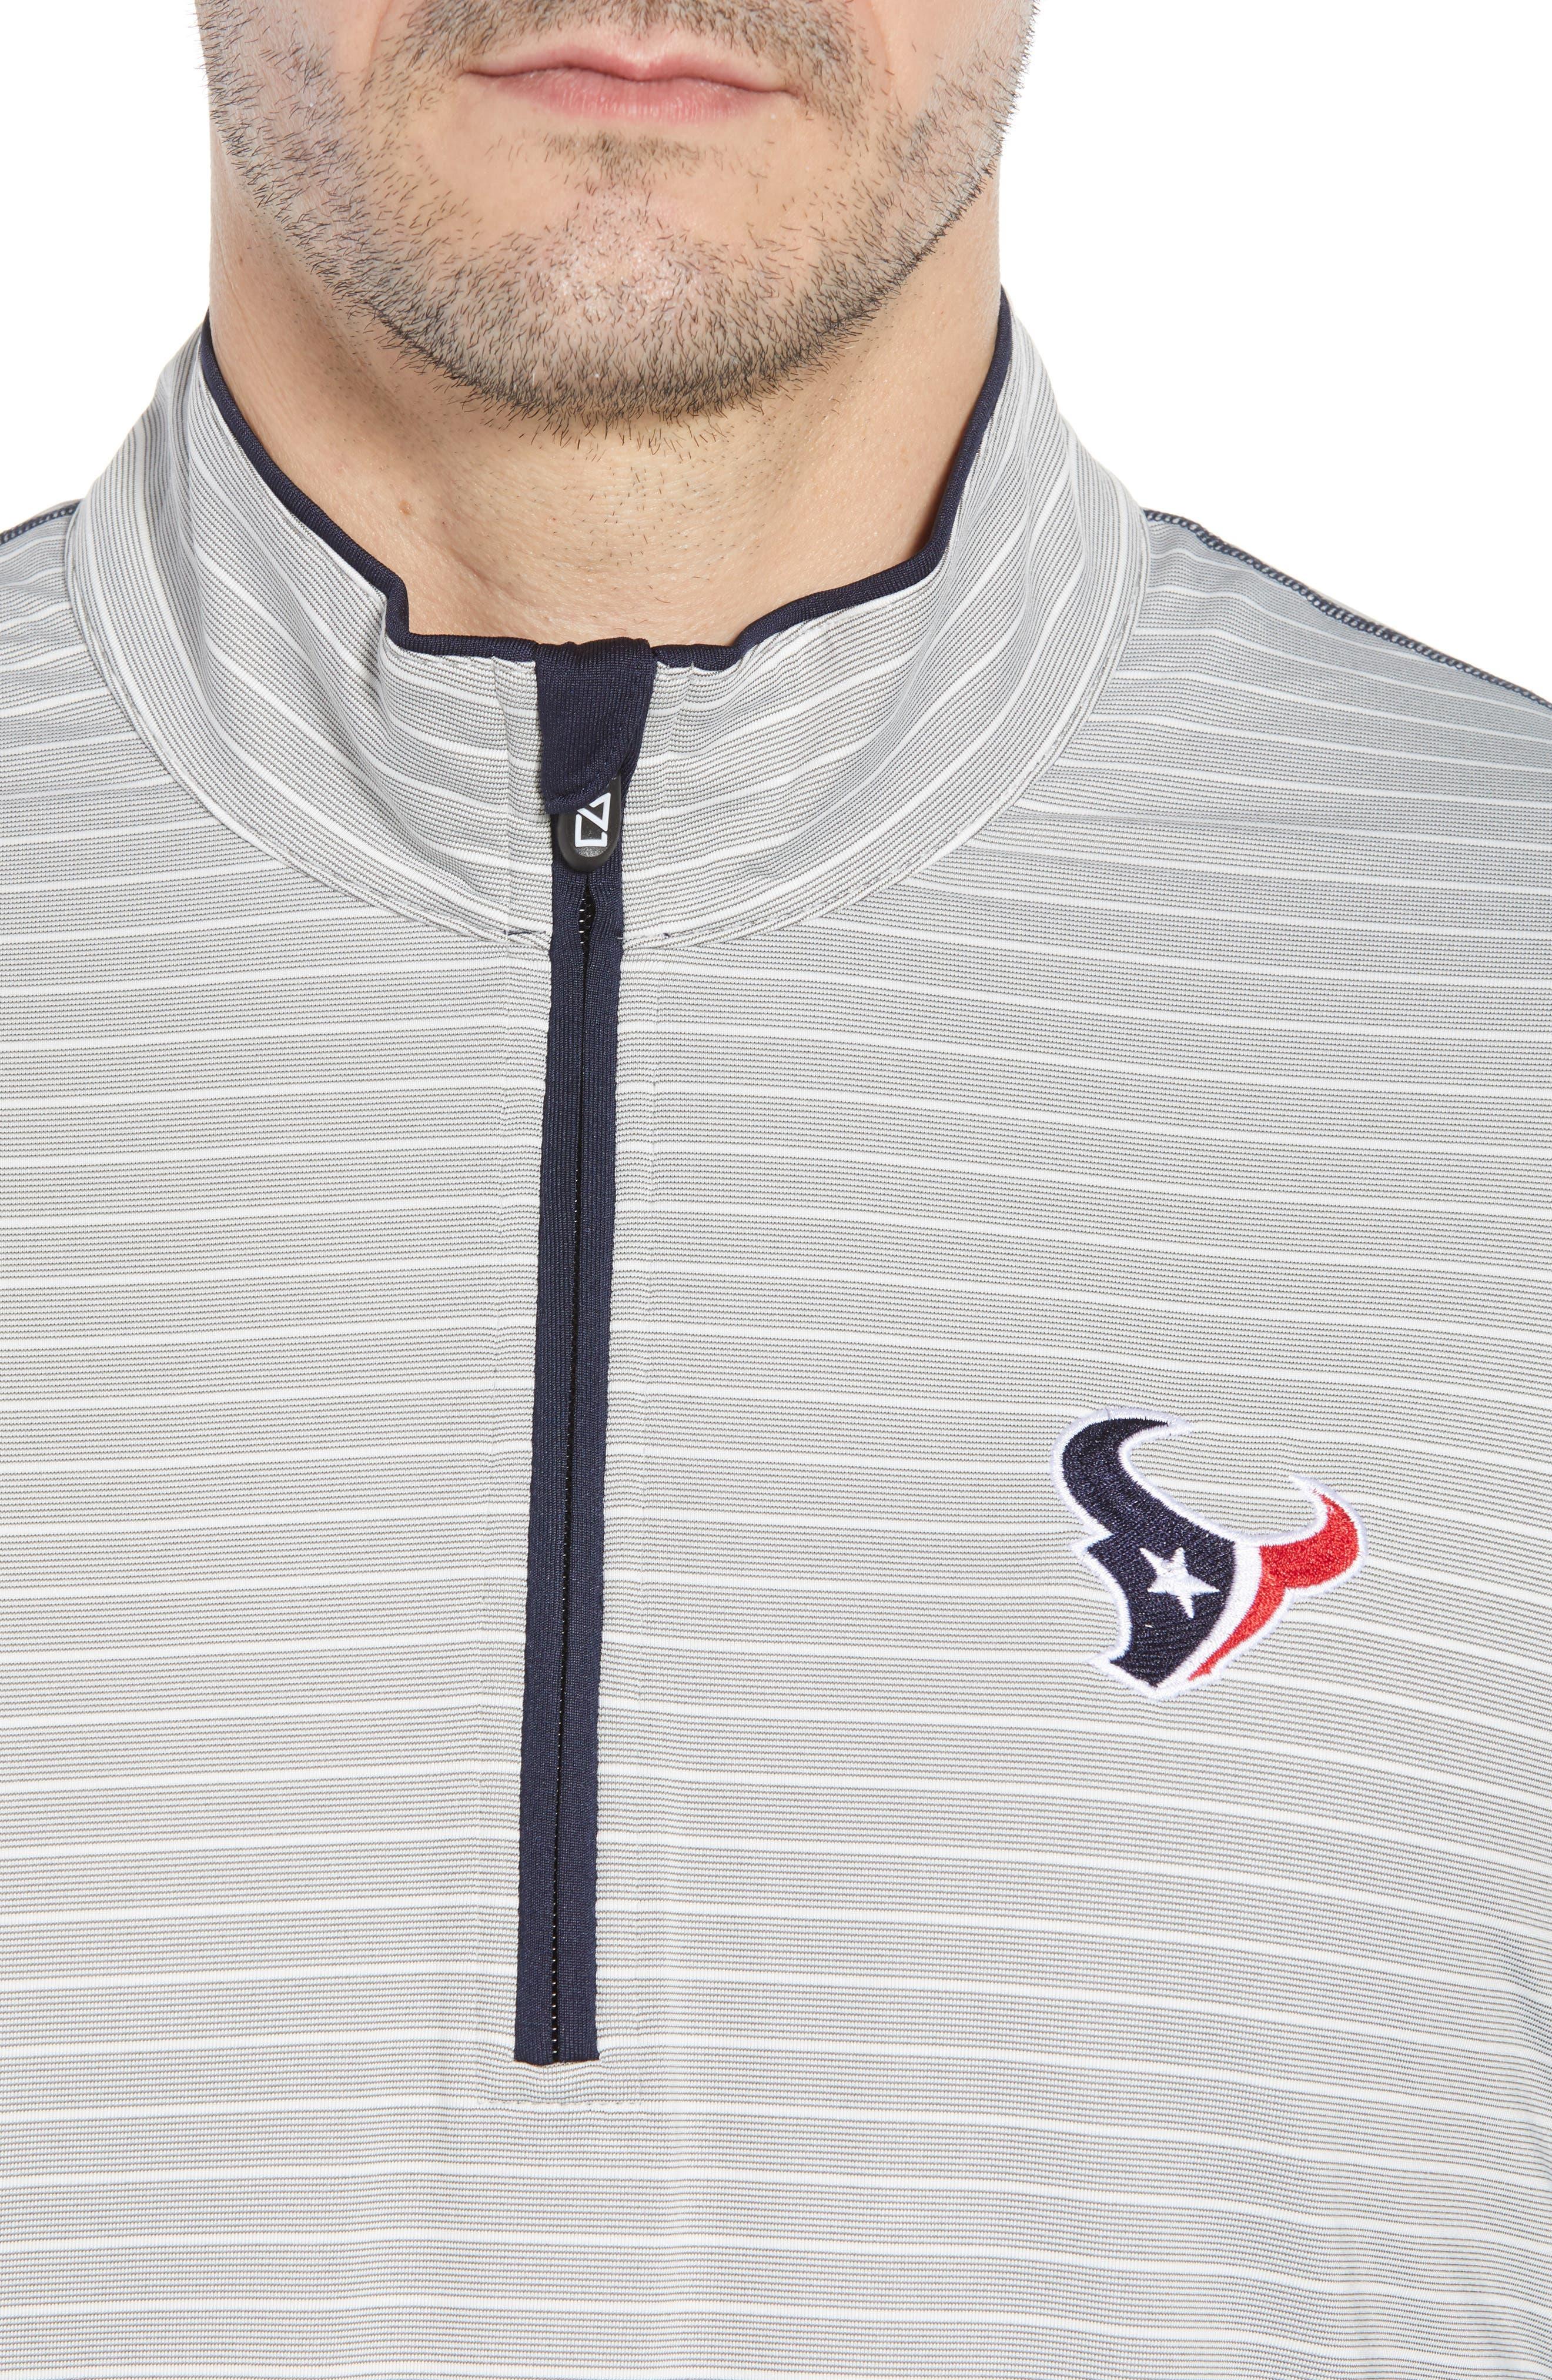 Meridian - Houston Texans Regular Fit Half Zip Pullover,                             Alternate thumbnail 4, color,                             NAVY